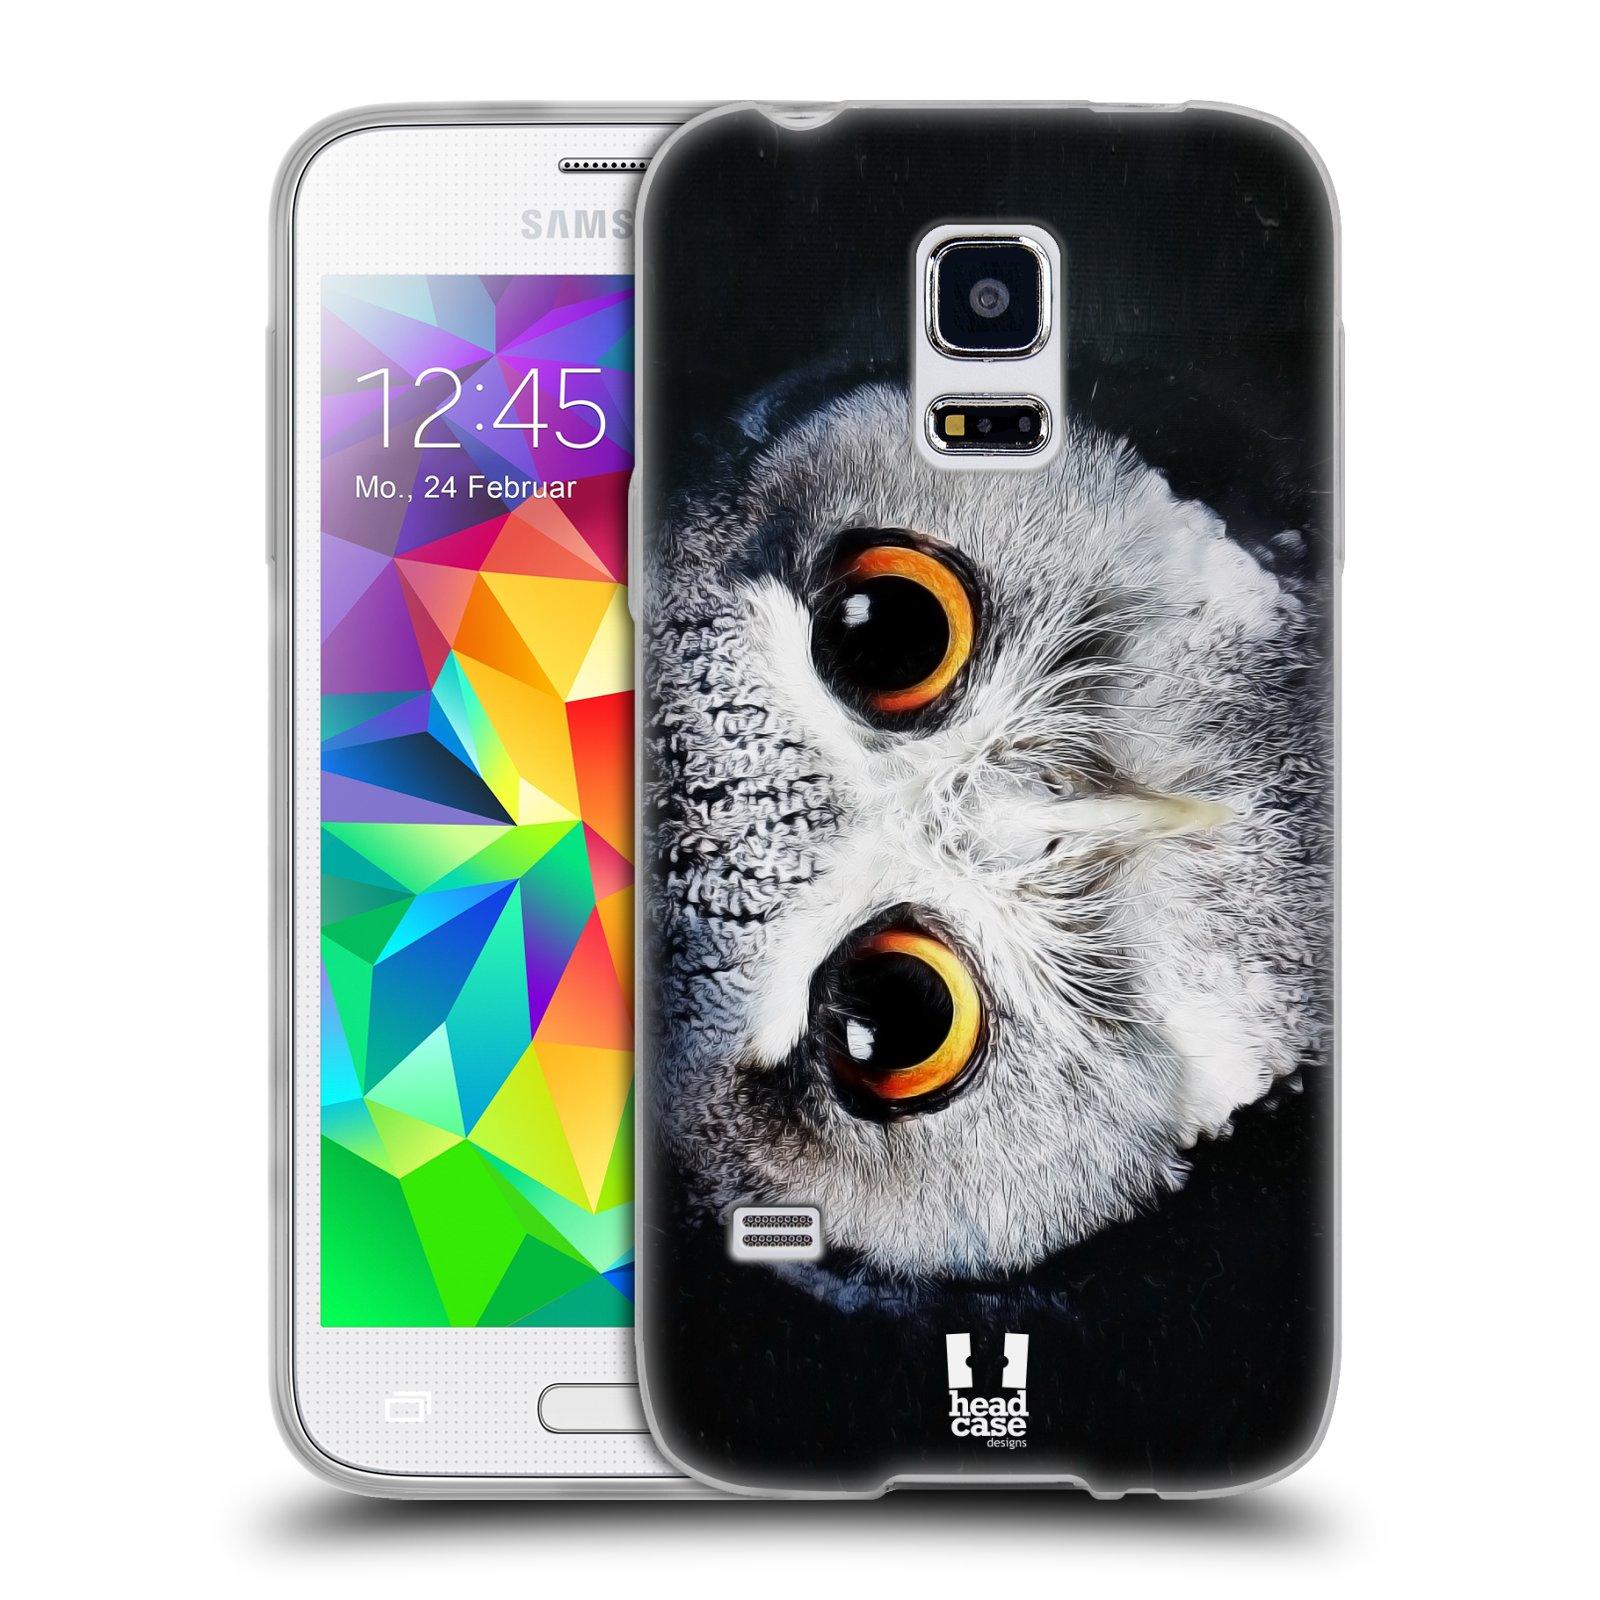 HEAD CASE silikonový obal na mobil Samsung Galaxy S5 MINI vzor Zvířecí tváře sova